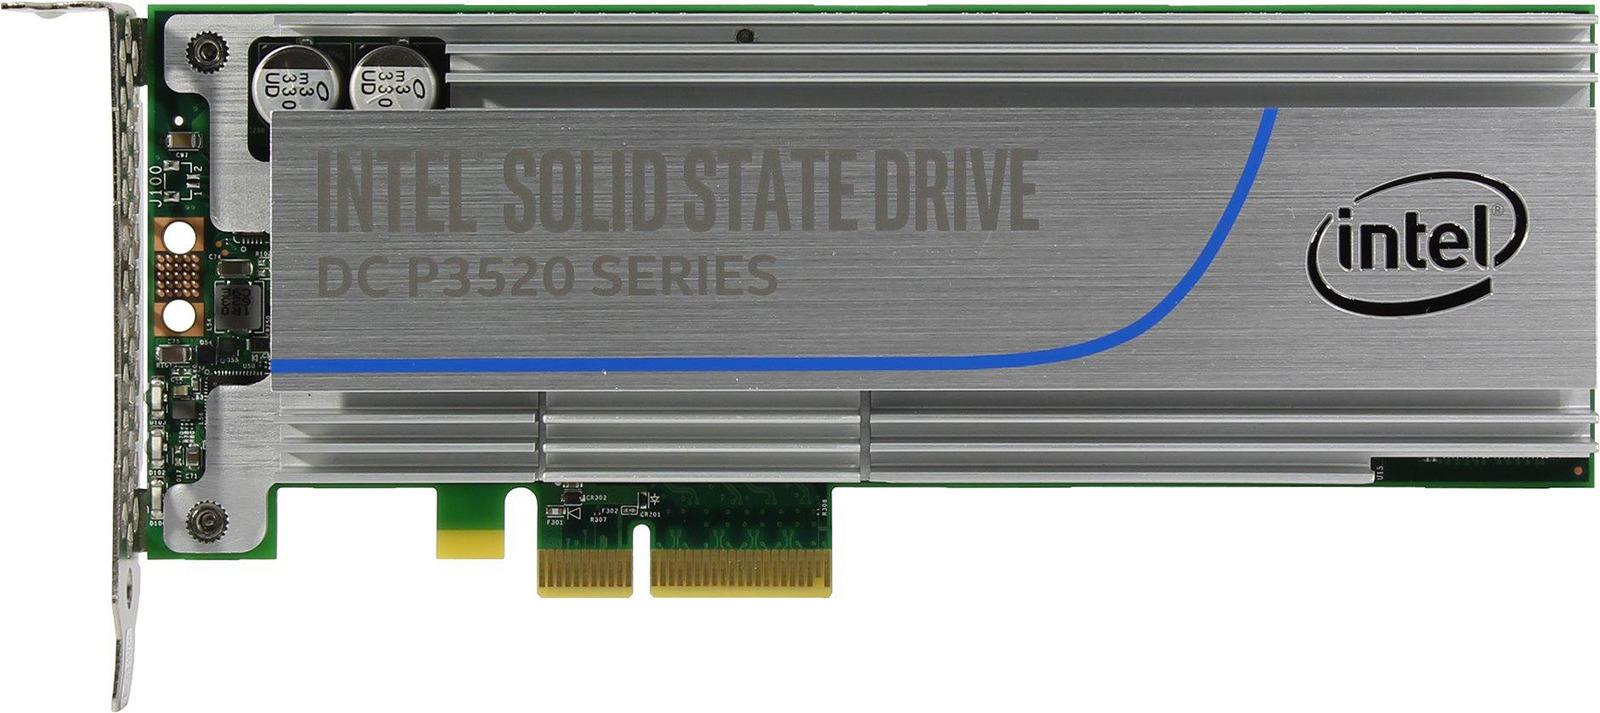 SSD накопитель Intel P3520 1228GB, SSDPEDMX012T701 твердотельный накопитель ssd intel ssd dc p3520 450gb ssdpe2mx450g701 u 2 2 5 r1200 w600